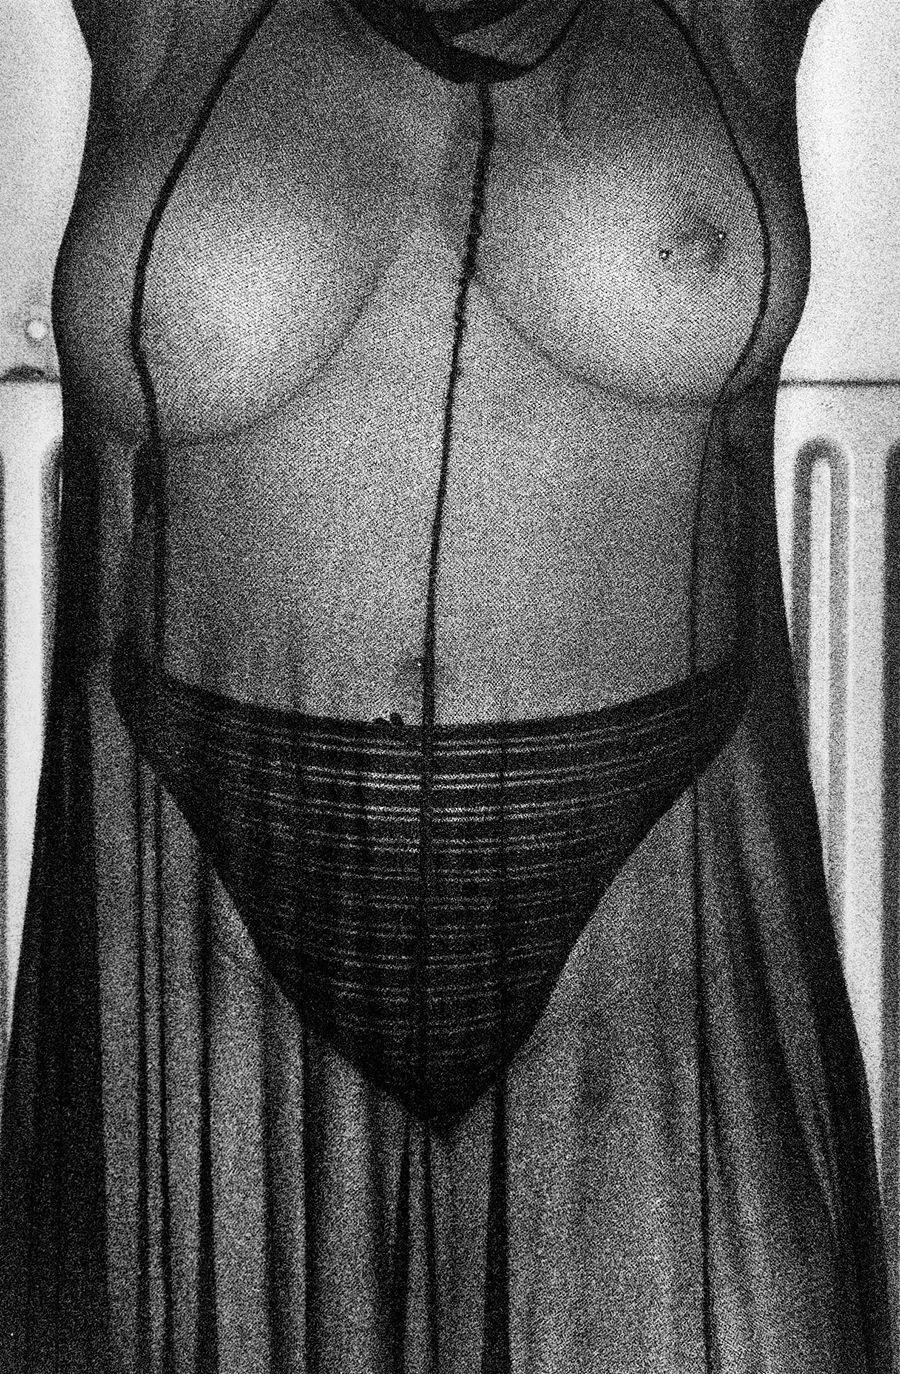 med-Tony_Ward_photography_documentary_wasteland_party_amsterdam_sheer_dress_nude_big_breast_piercings_panties